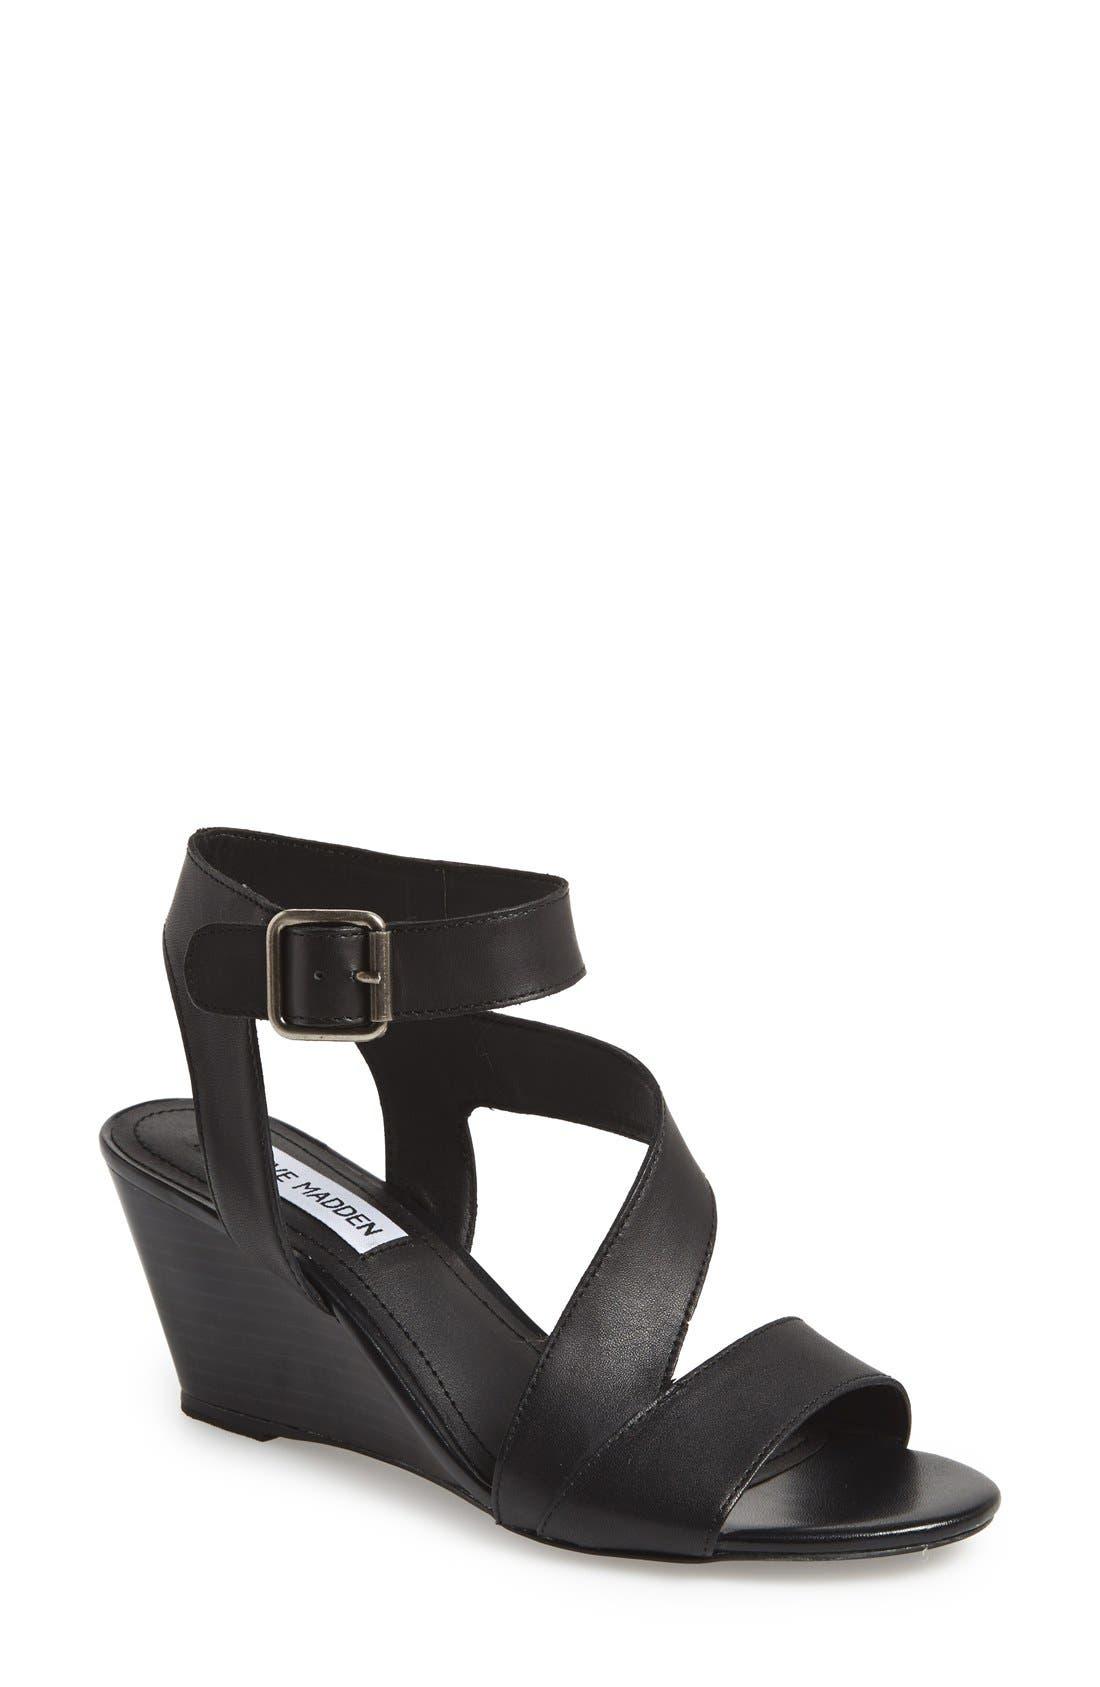 STEVE MADDEN 'Stipend' Wedge Leather Sandal, Main, color, 001